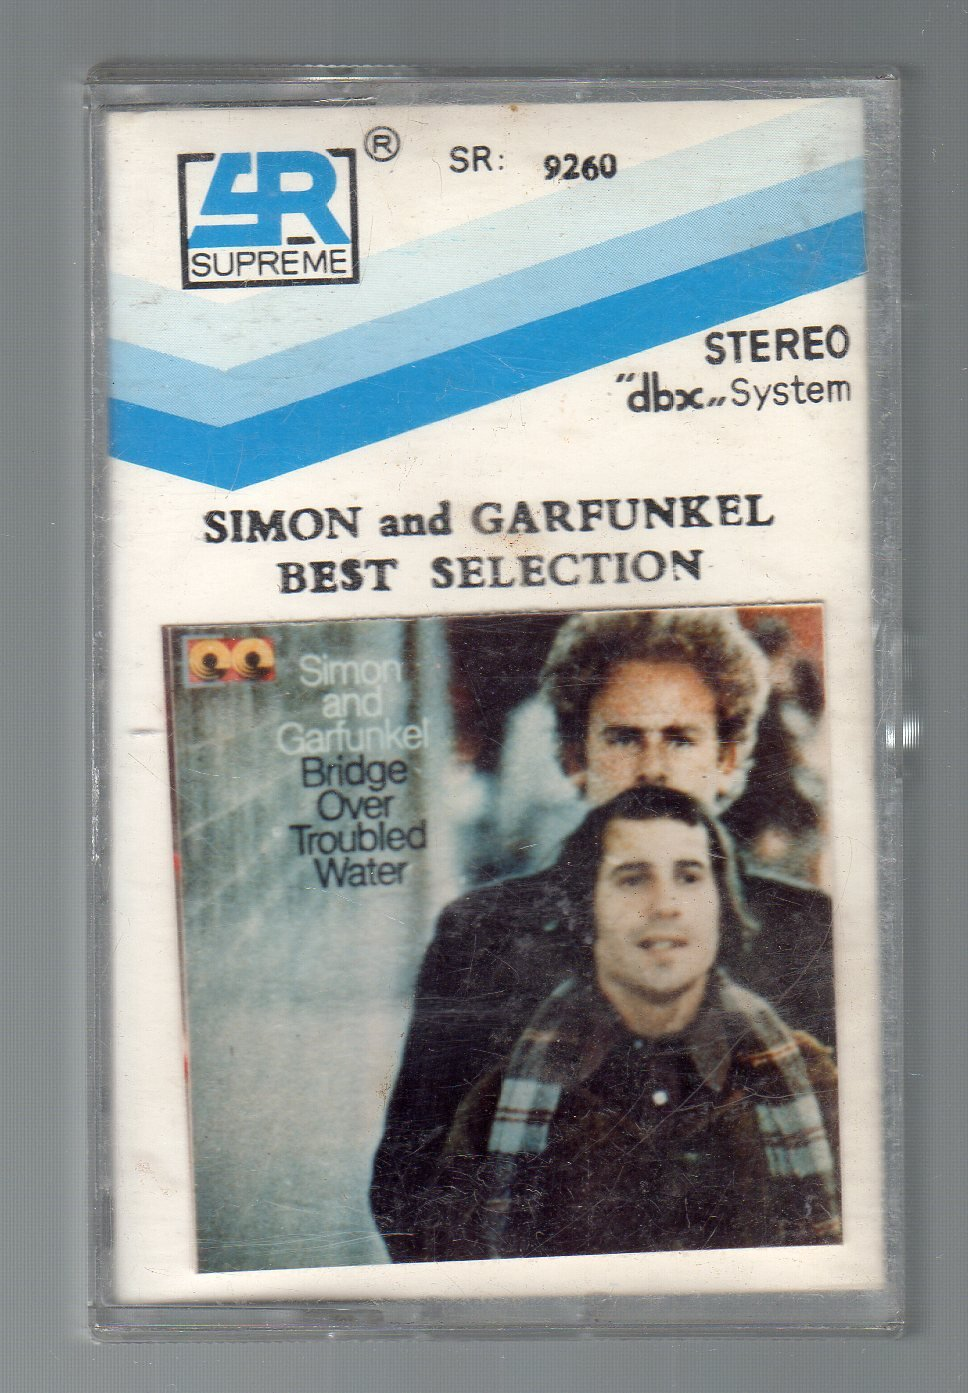 Simon & Garfunkel - Best Selection, Bridge Over Troubled Water RARE Cassette Tape